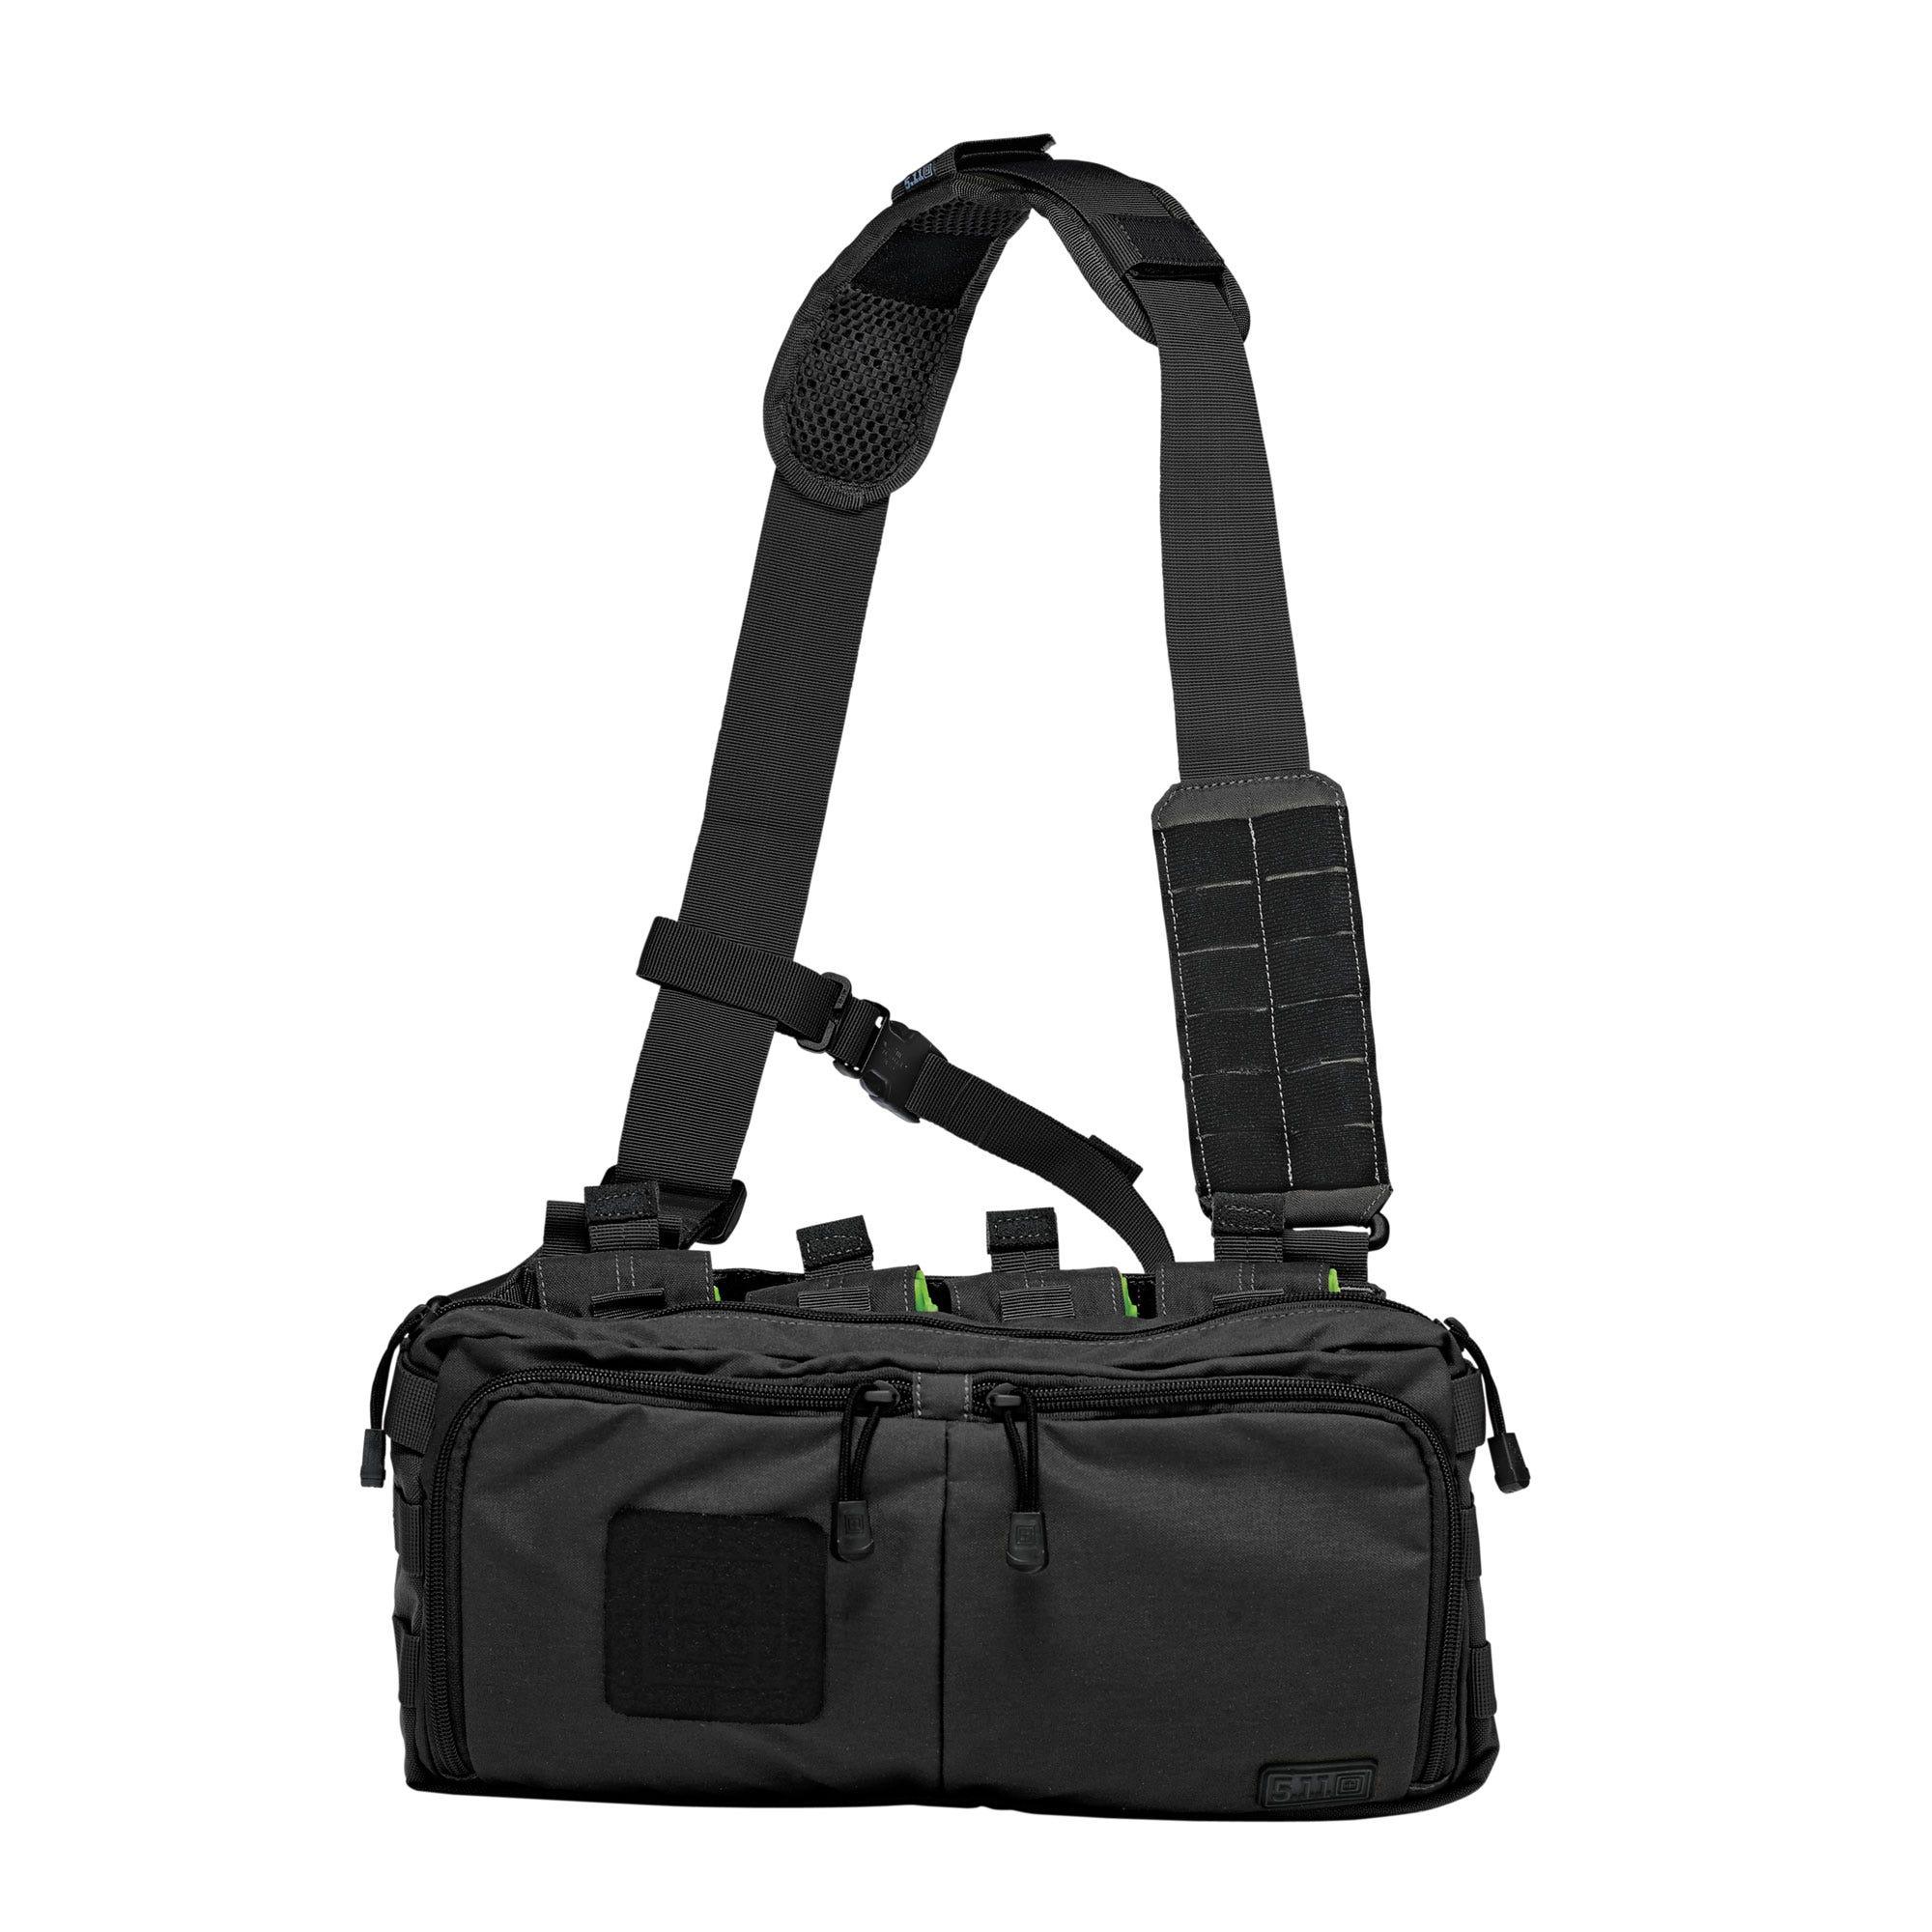 5.11 Tactical 4-Banger Bag (Black) thumbnail